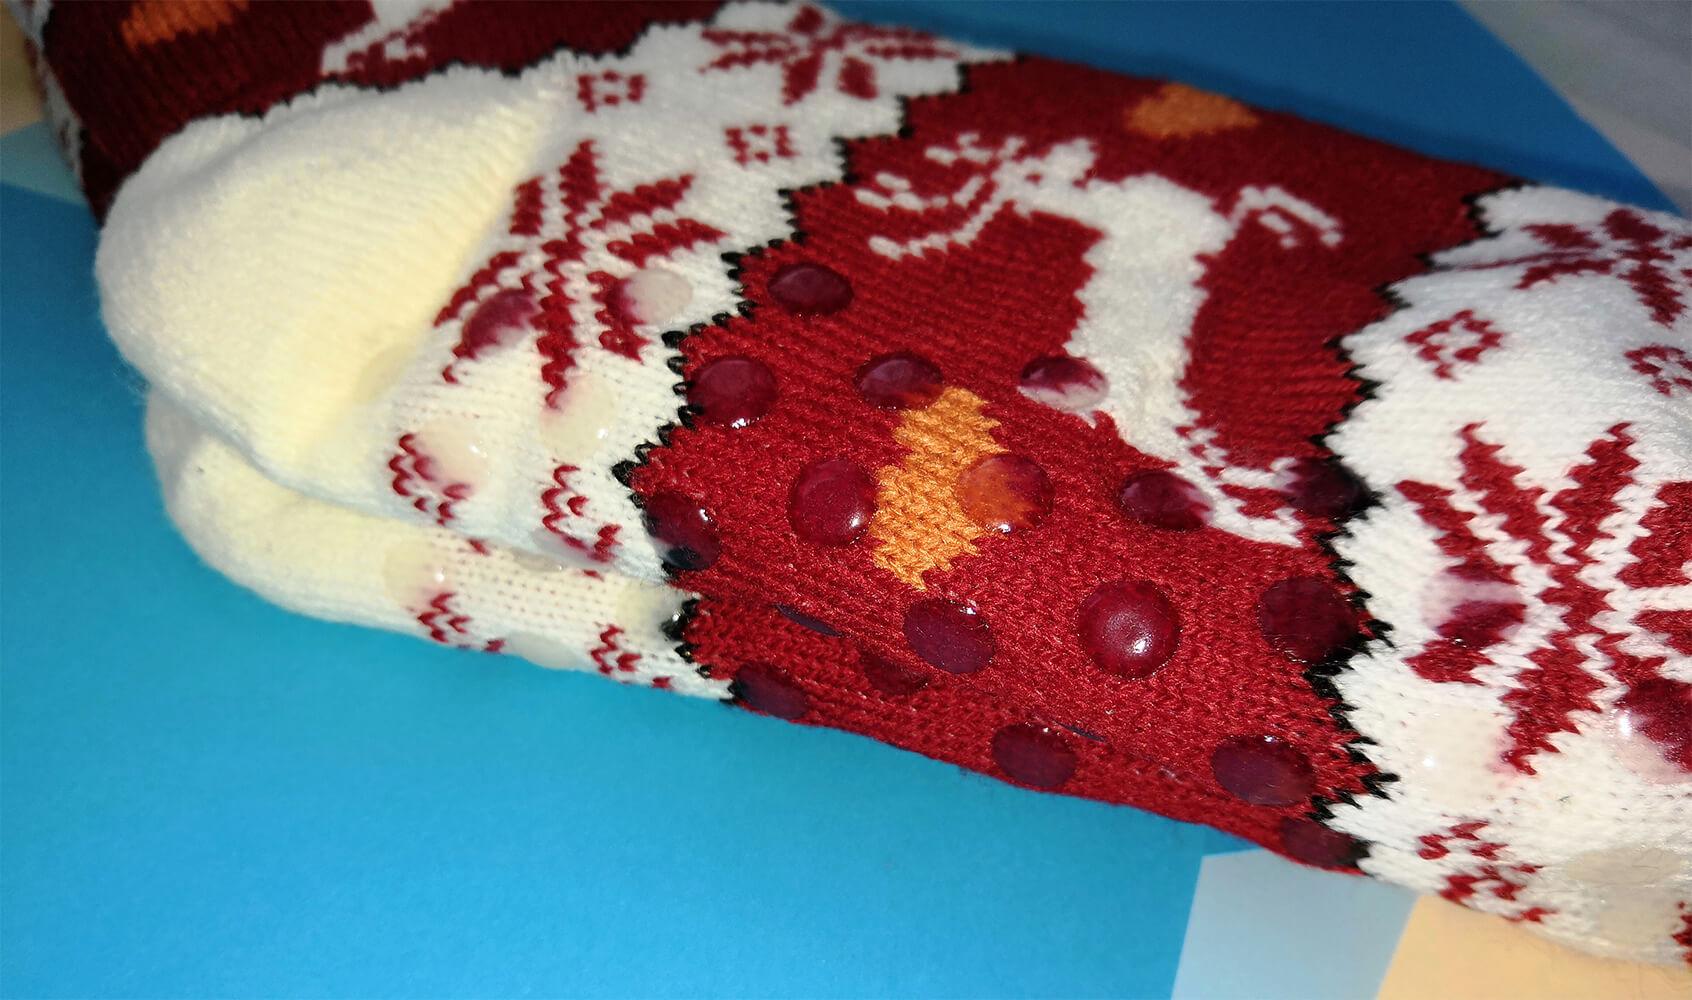 Женские тапочки-носки Emi Ross EJ-248-r красного цвета. Фото 2